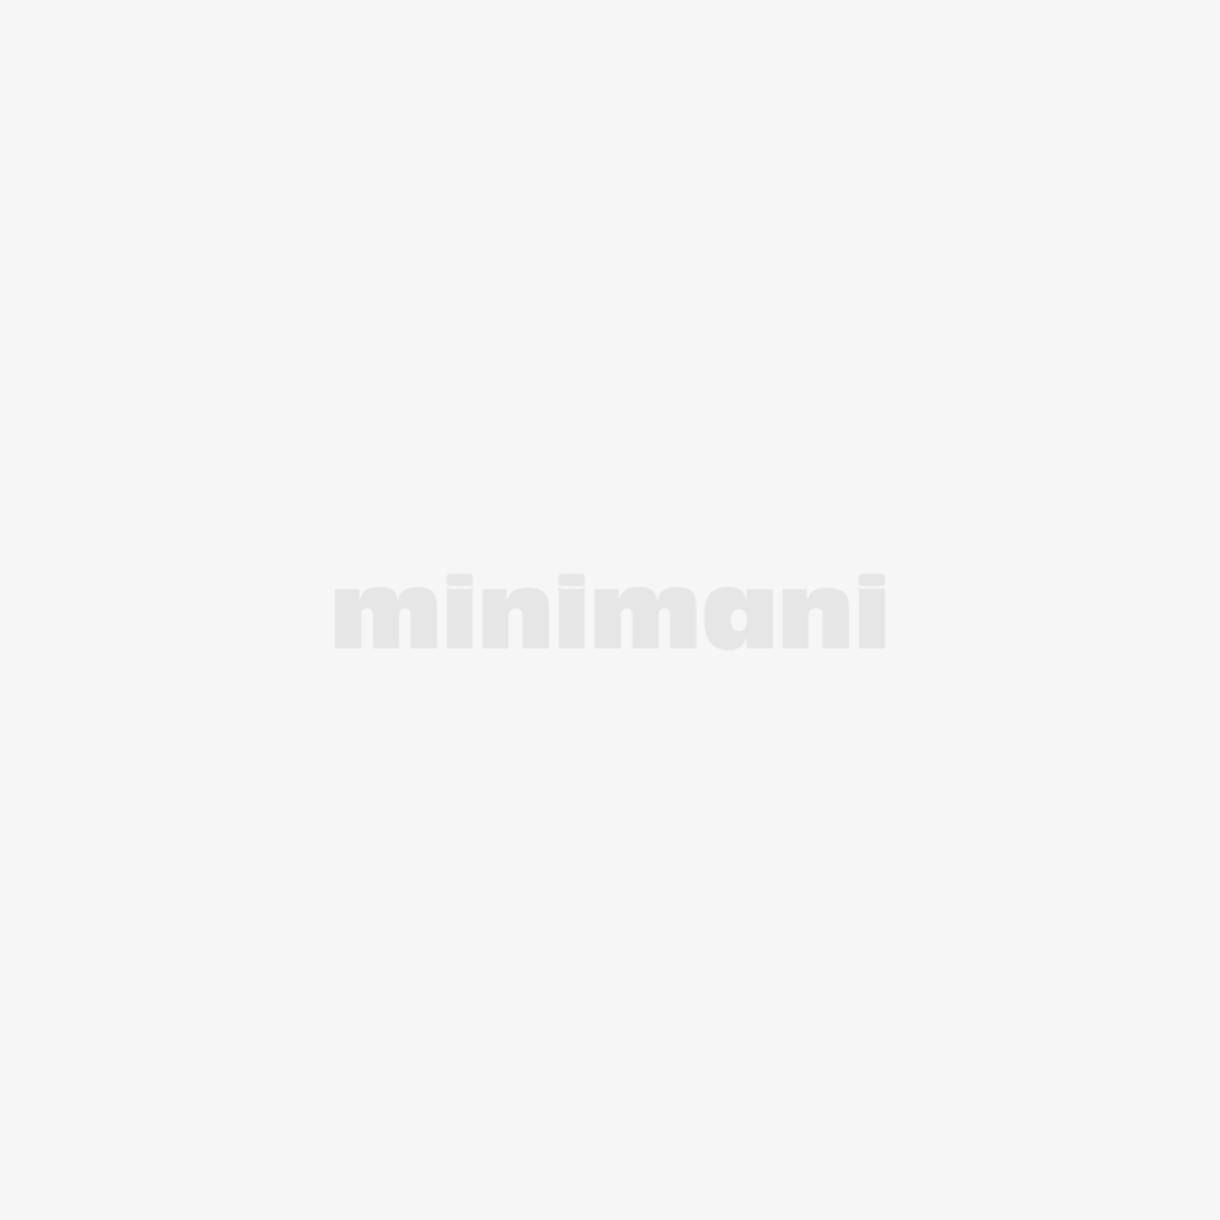 Vallila matto 80x230cm, Selma harmaa